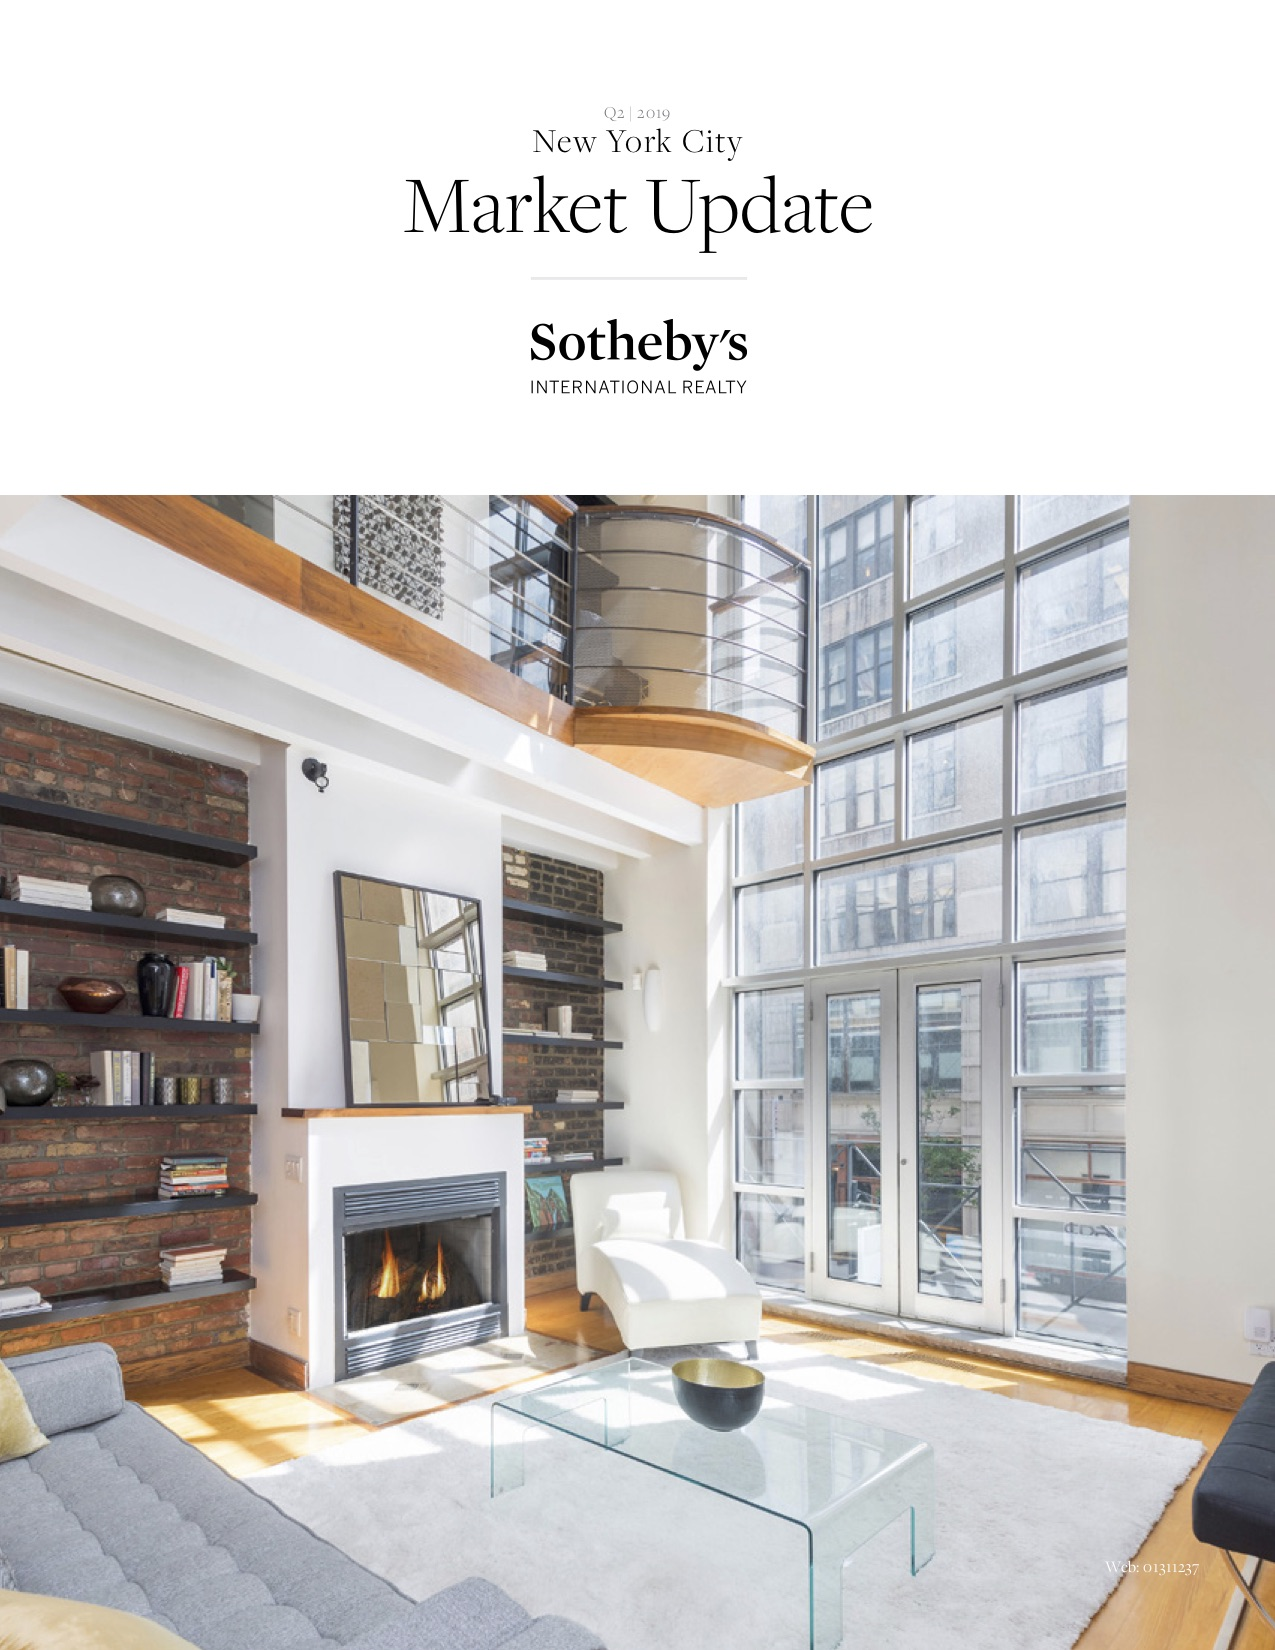 NYCMarketUpdate_Q2_2019_1.jpg